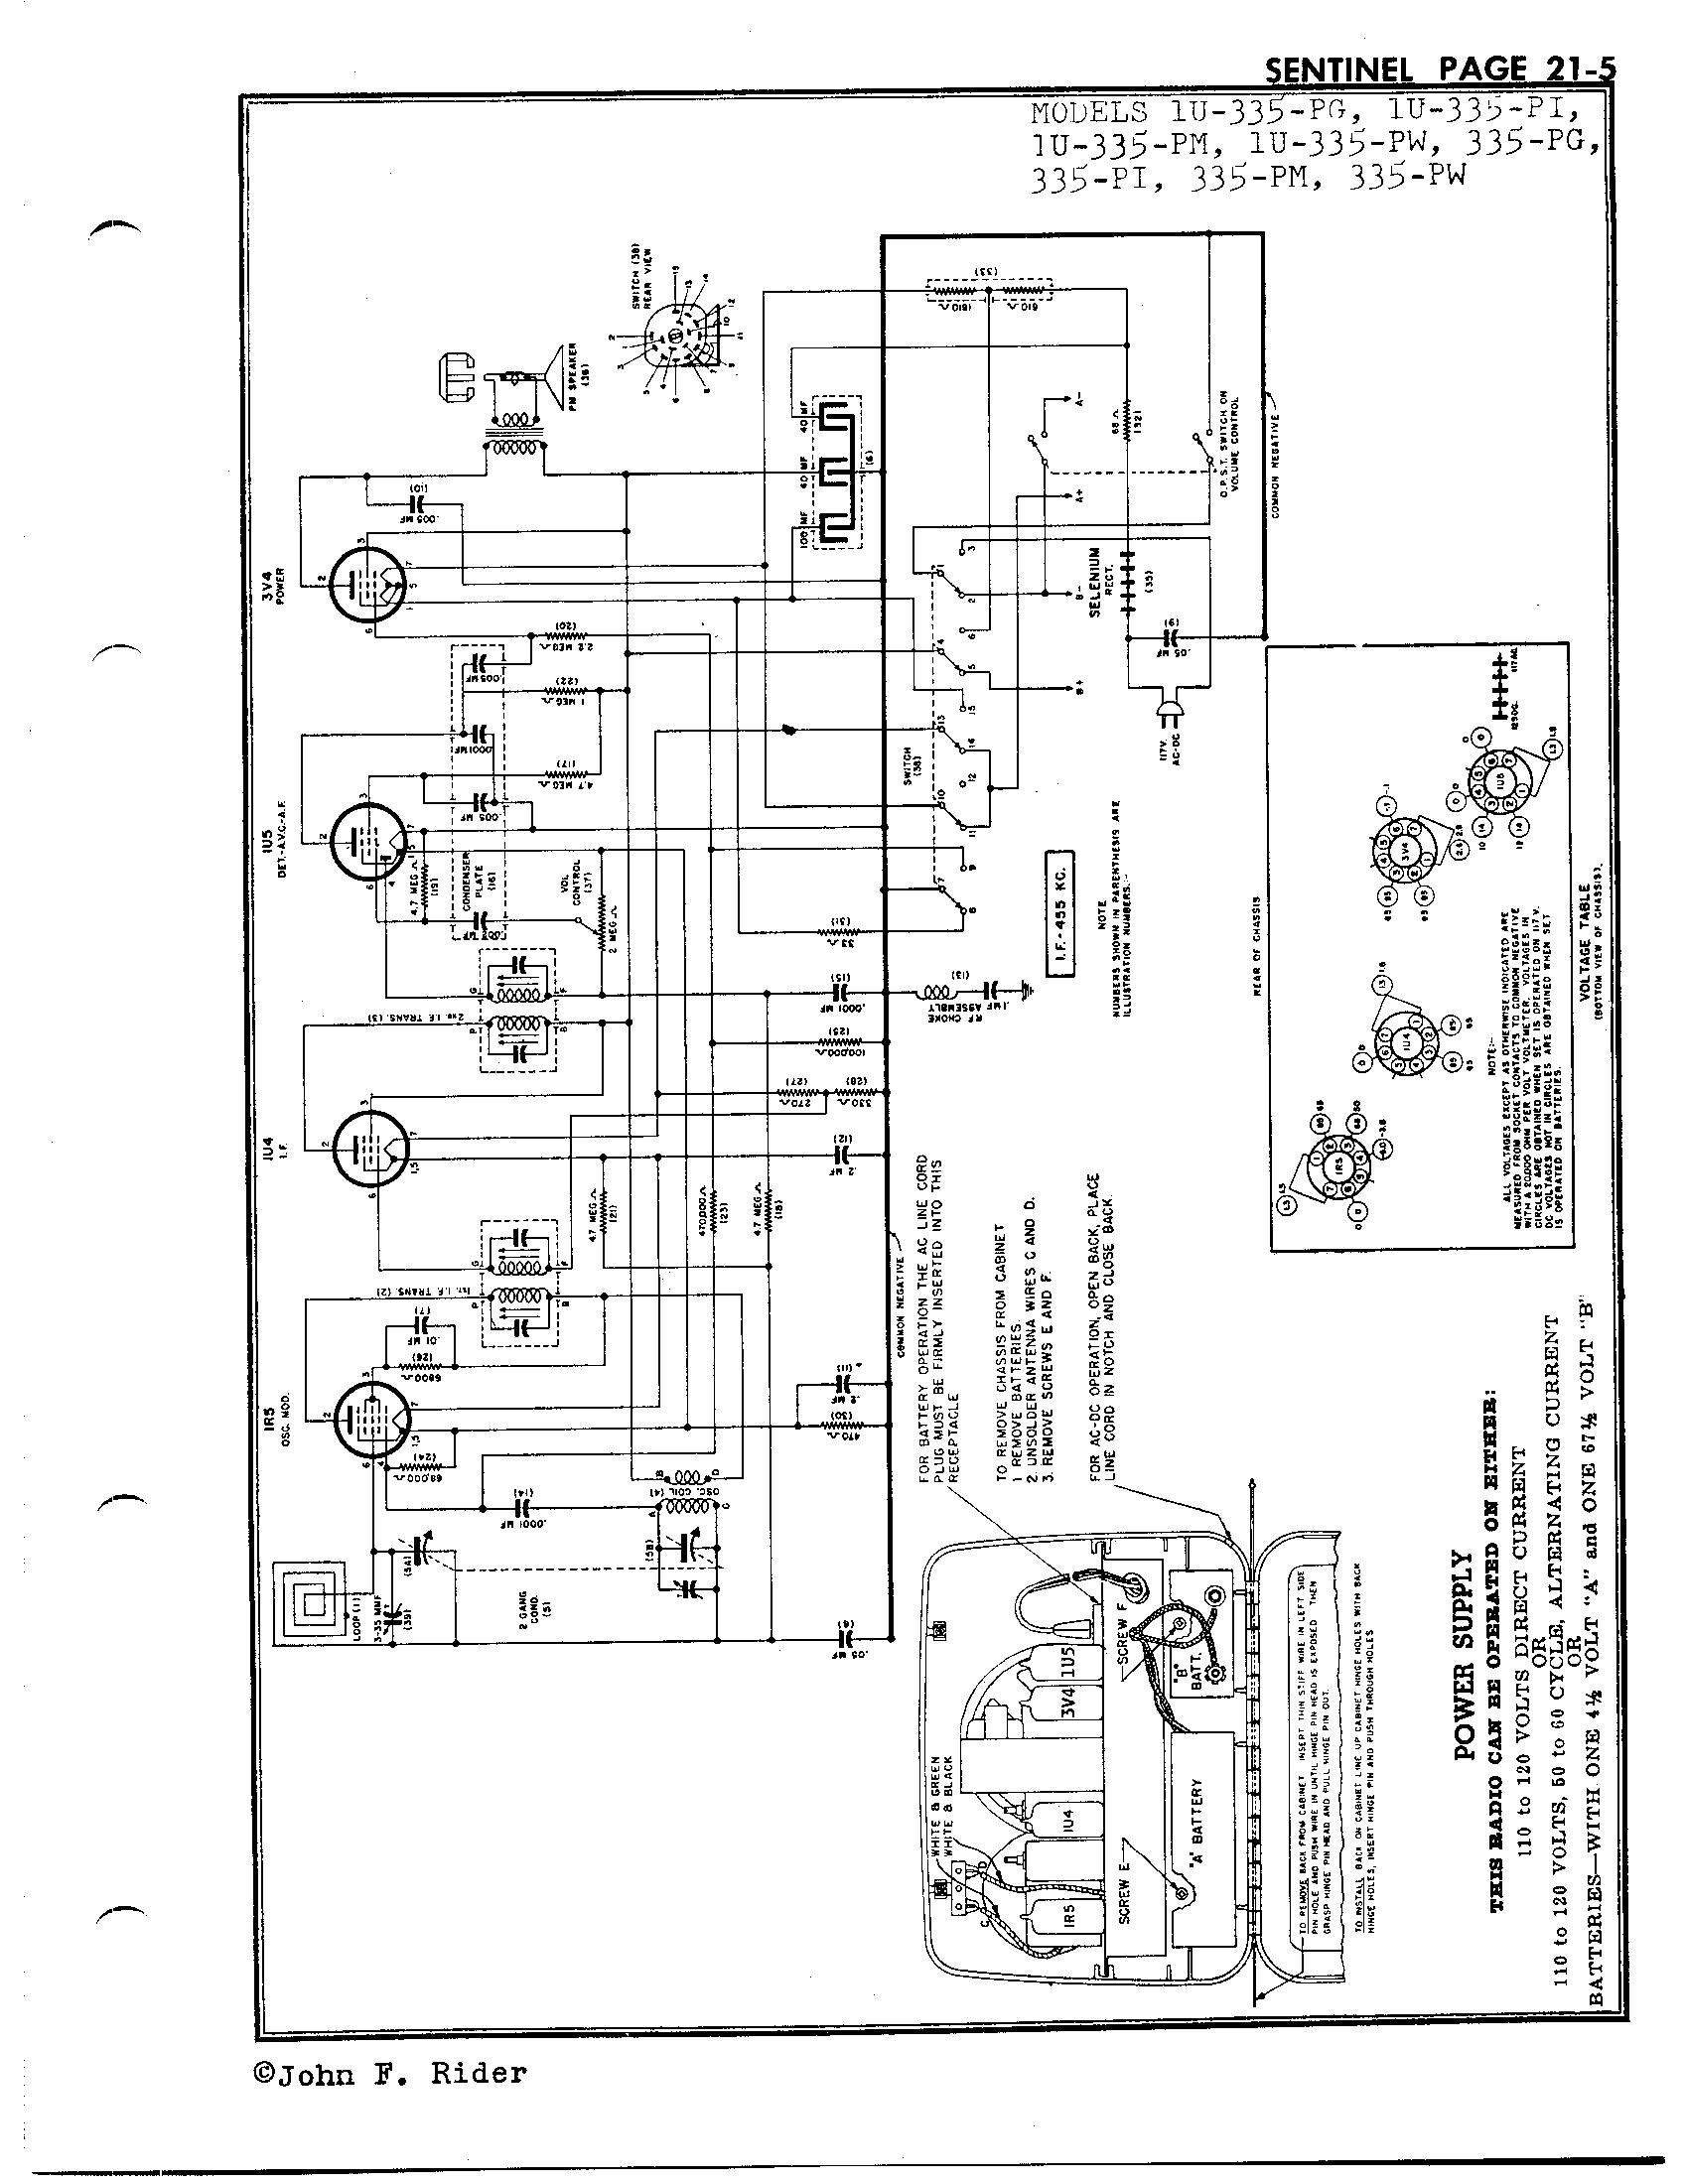 Sentinel Radio Corp. 1U-335-PM | Antique Electronic Supply